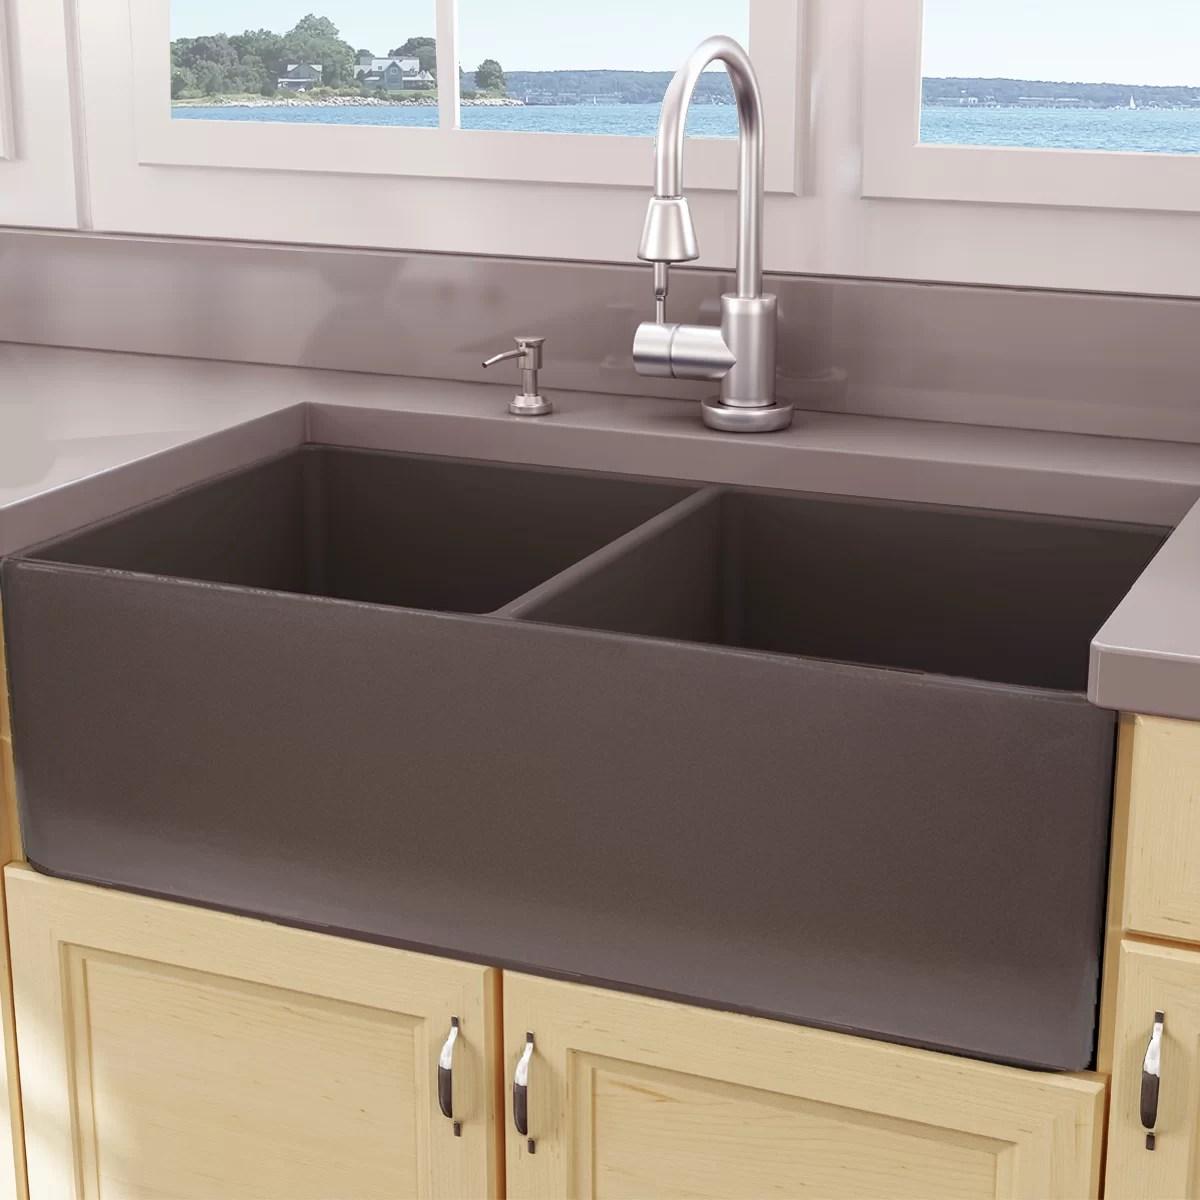 cape 33 l x 18 w double basin farmhouse apron kitchen sink